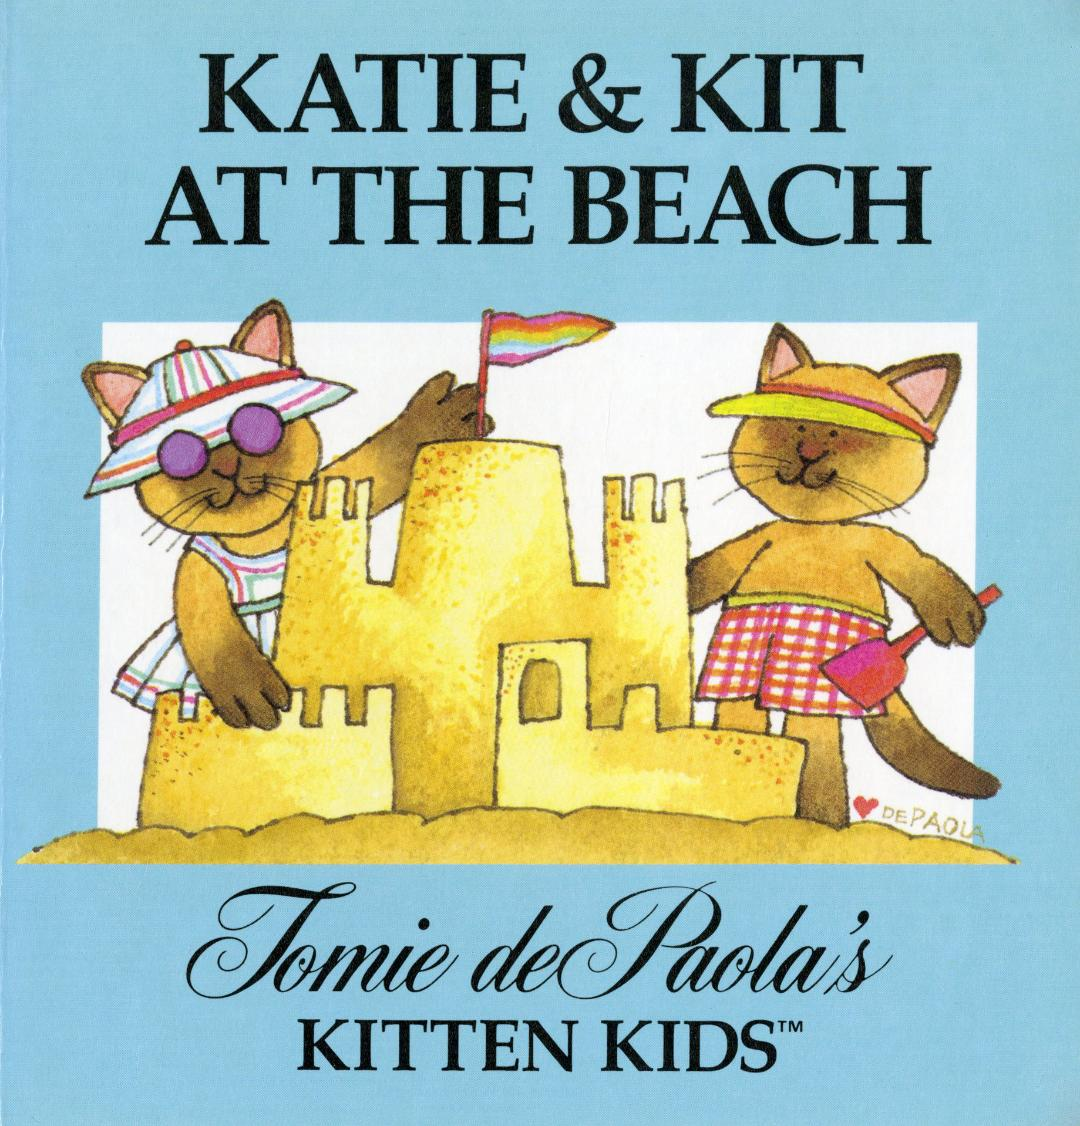 Katie & Kit at the Beach.jpg